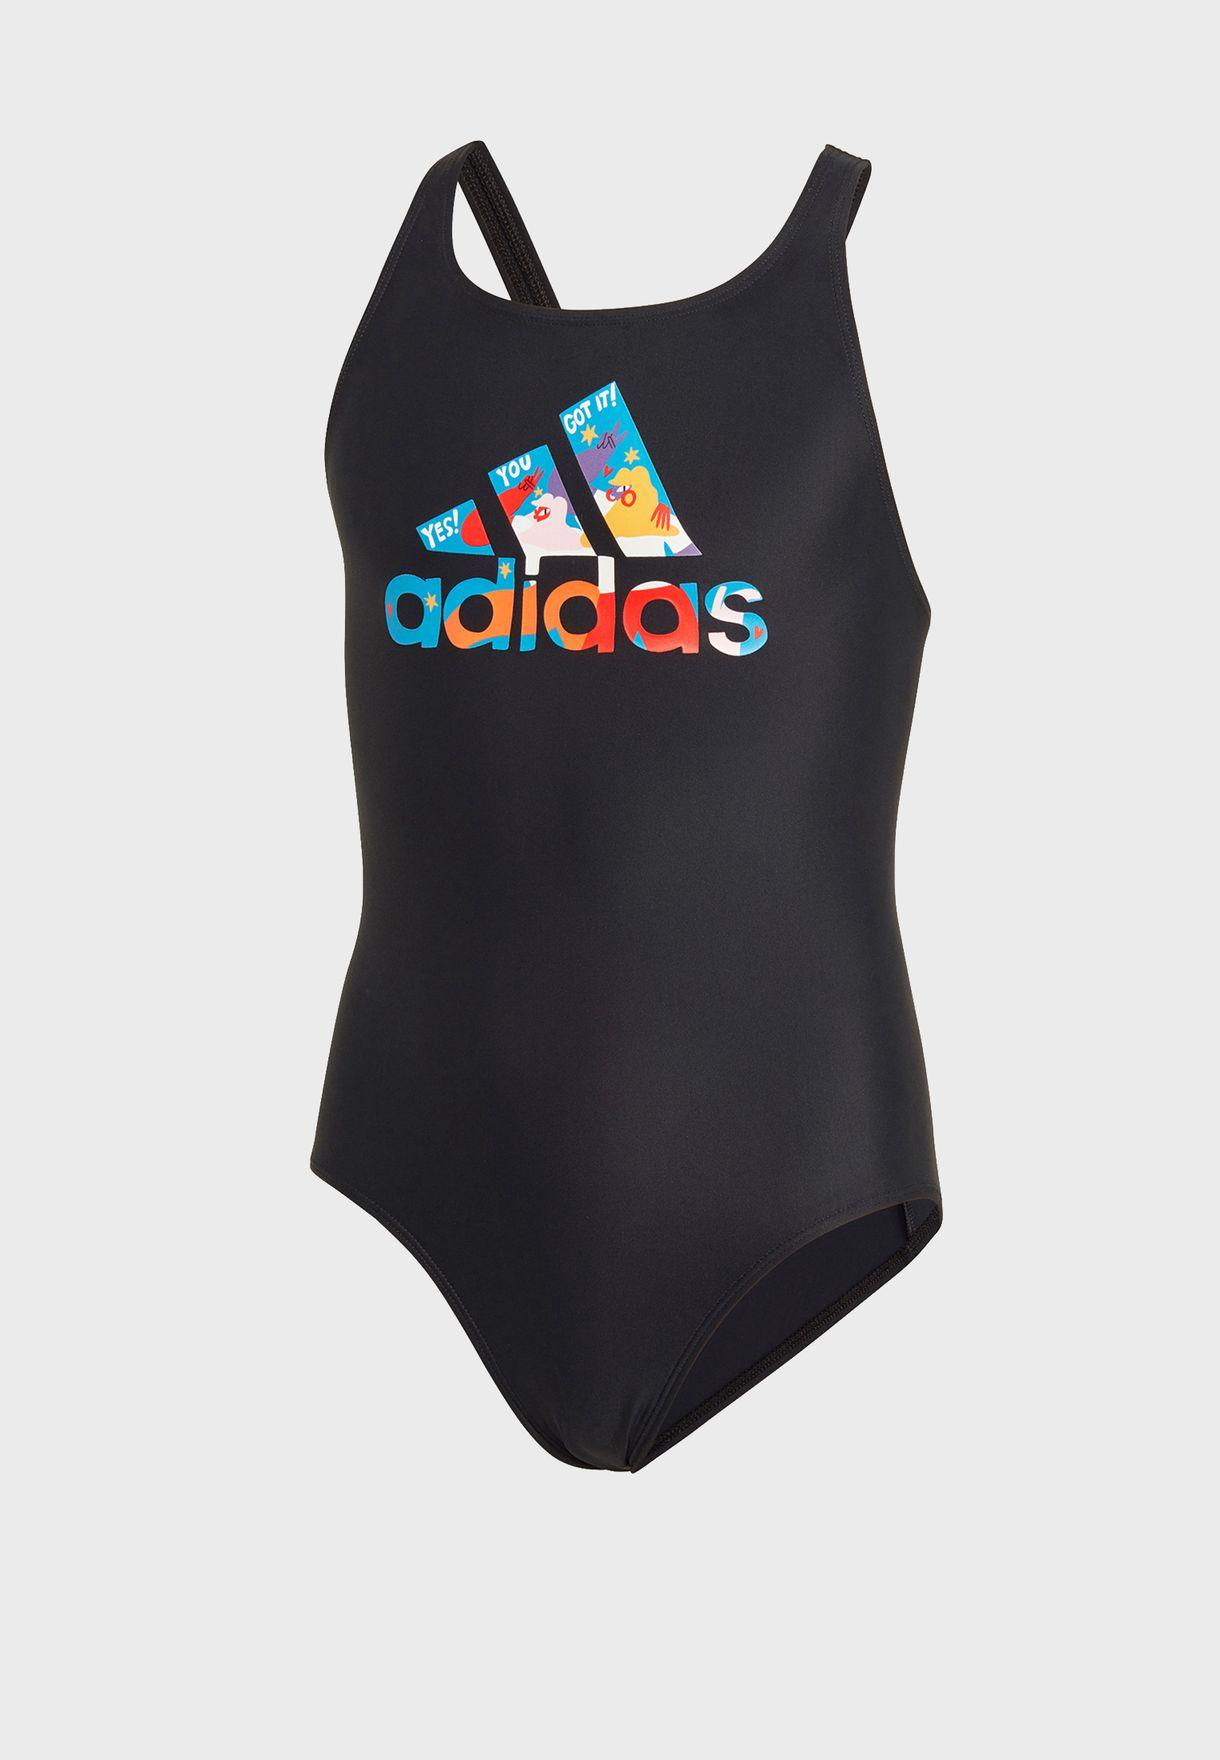 Kids Eagle Swimsuit